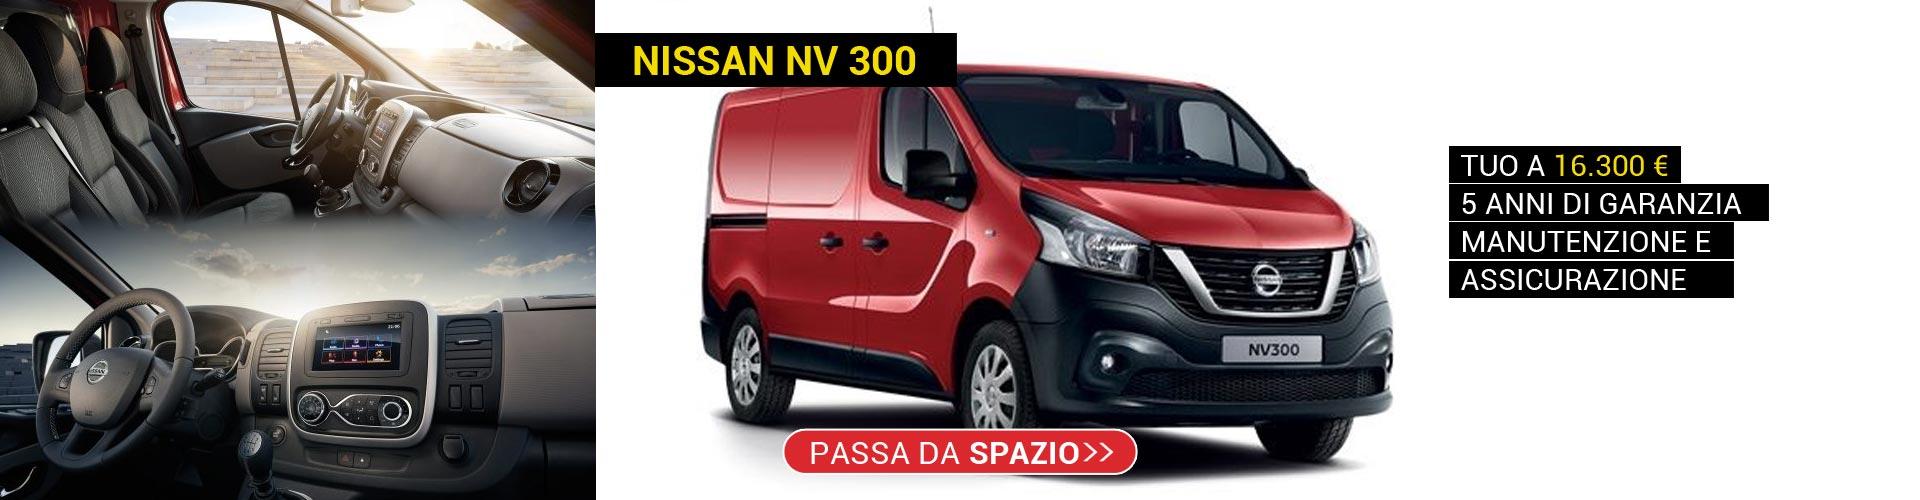 Nissan NV 300 Van